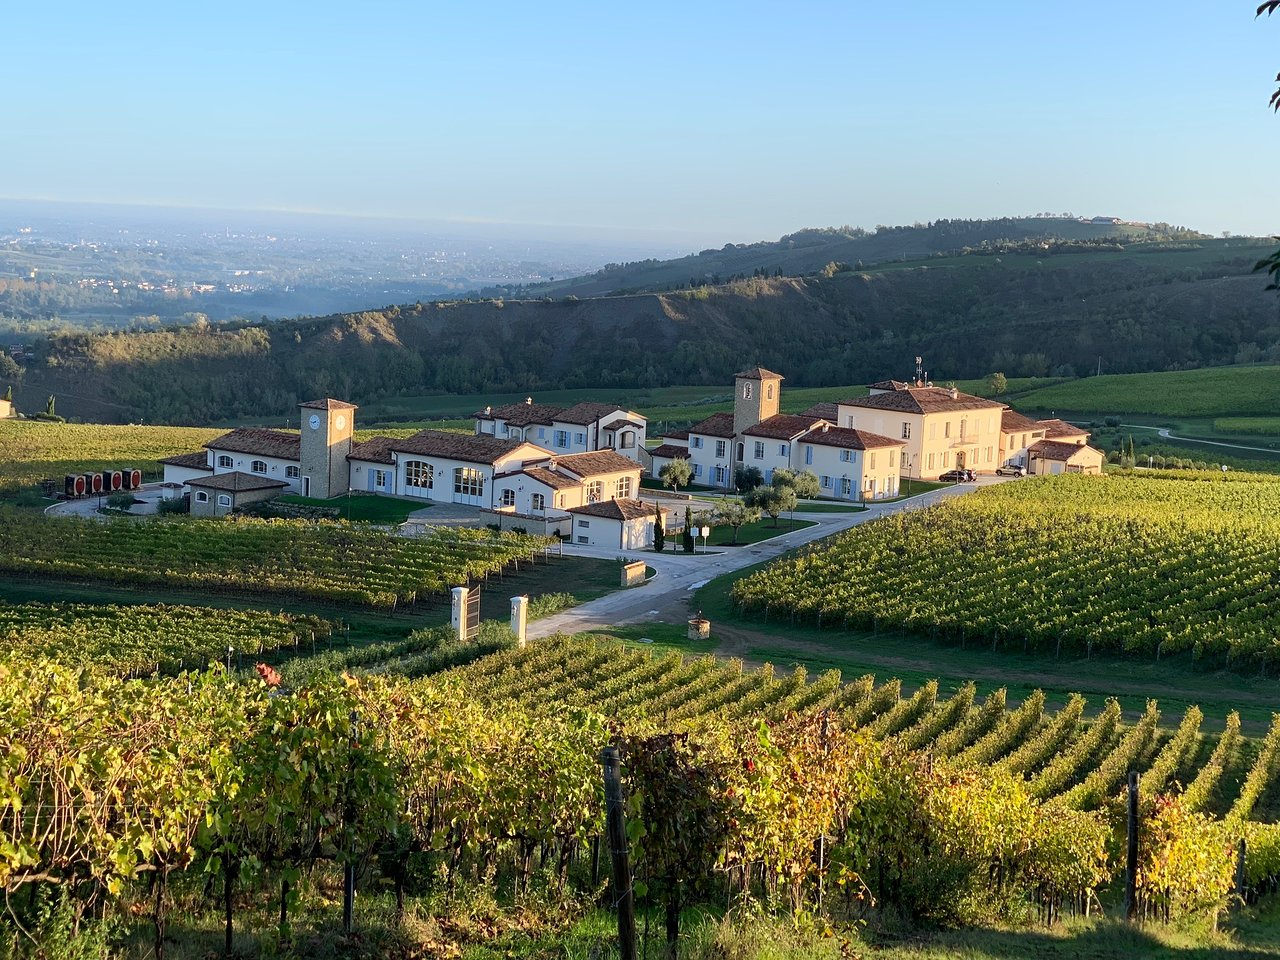 Cimitero Monumentale Predappio Fc borgo conde wine resort $167 ($̶1̶9̶2̶) - updated 2020